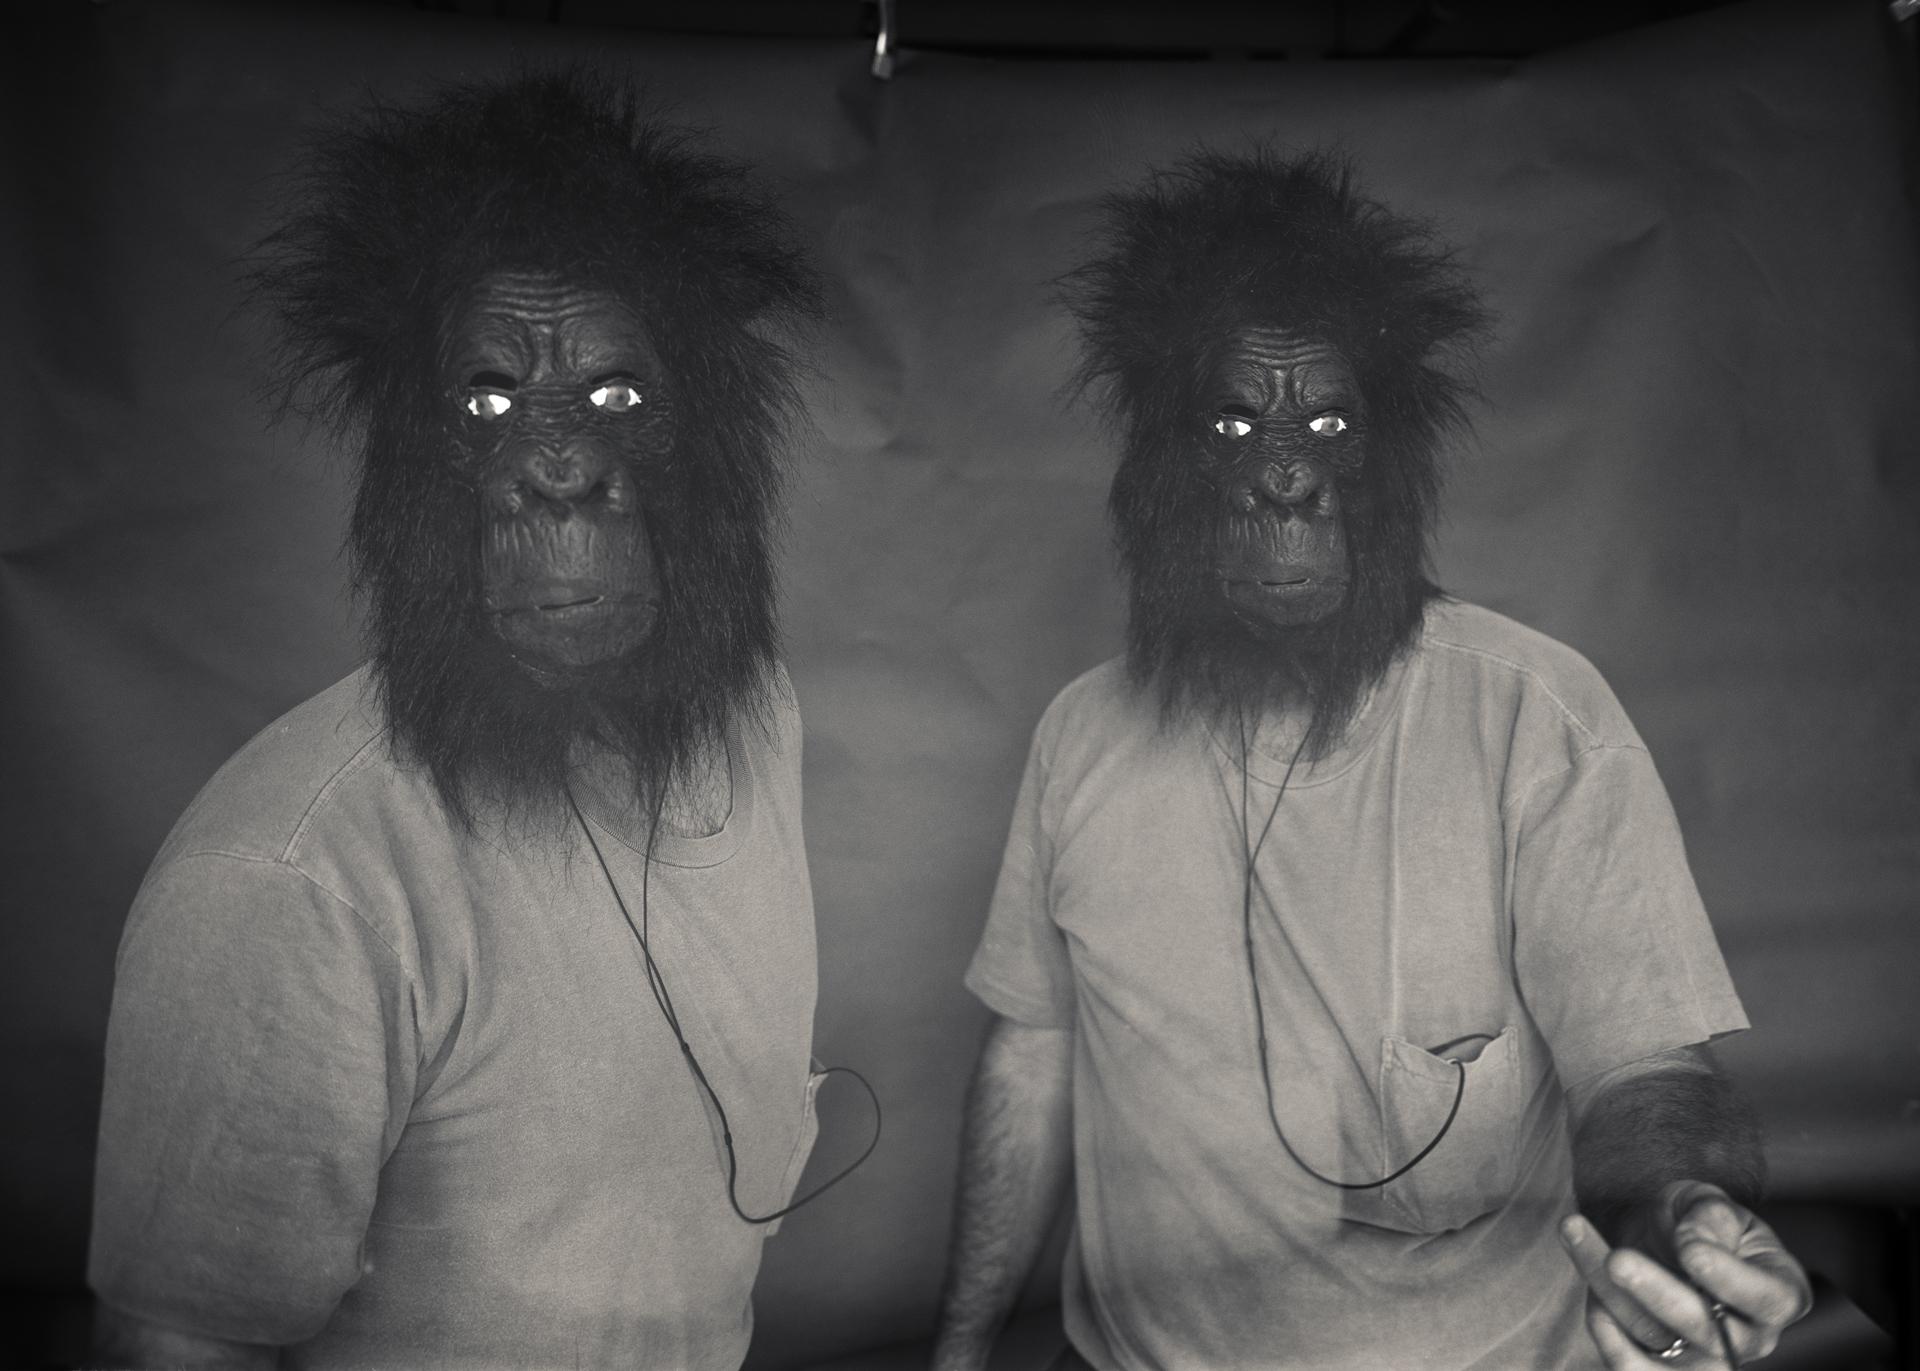 GorillaGodzilla002.jpg